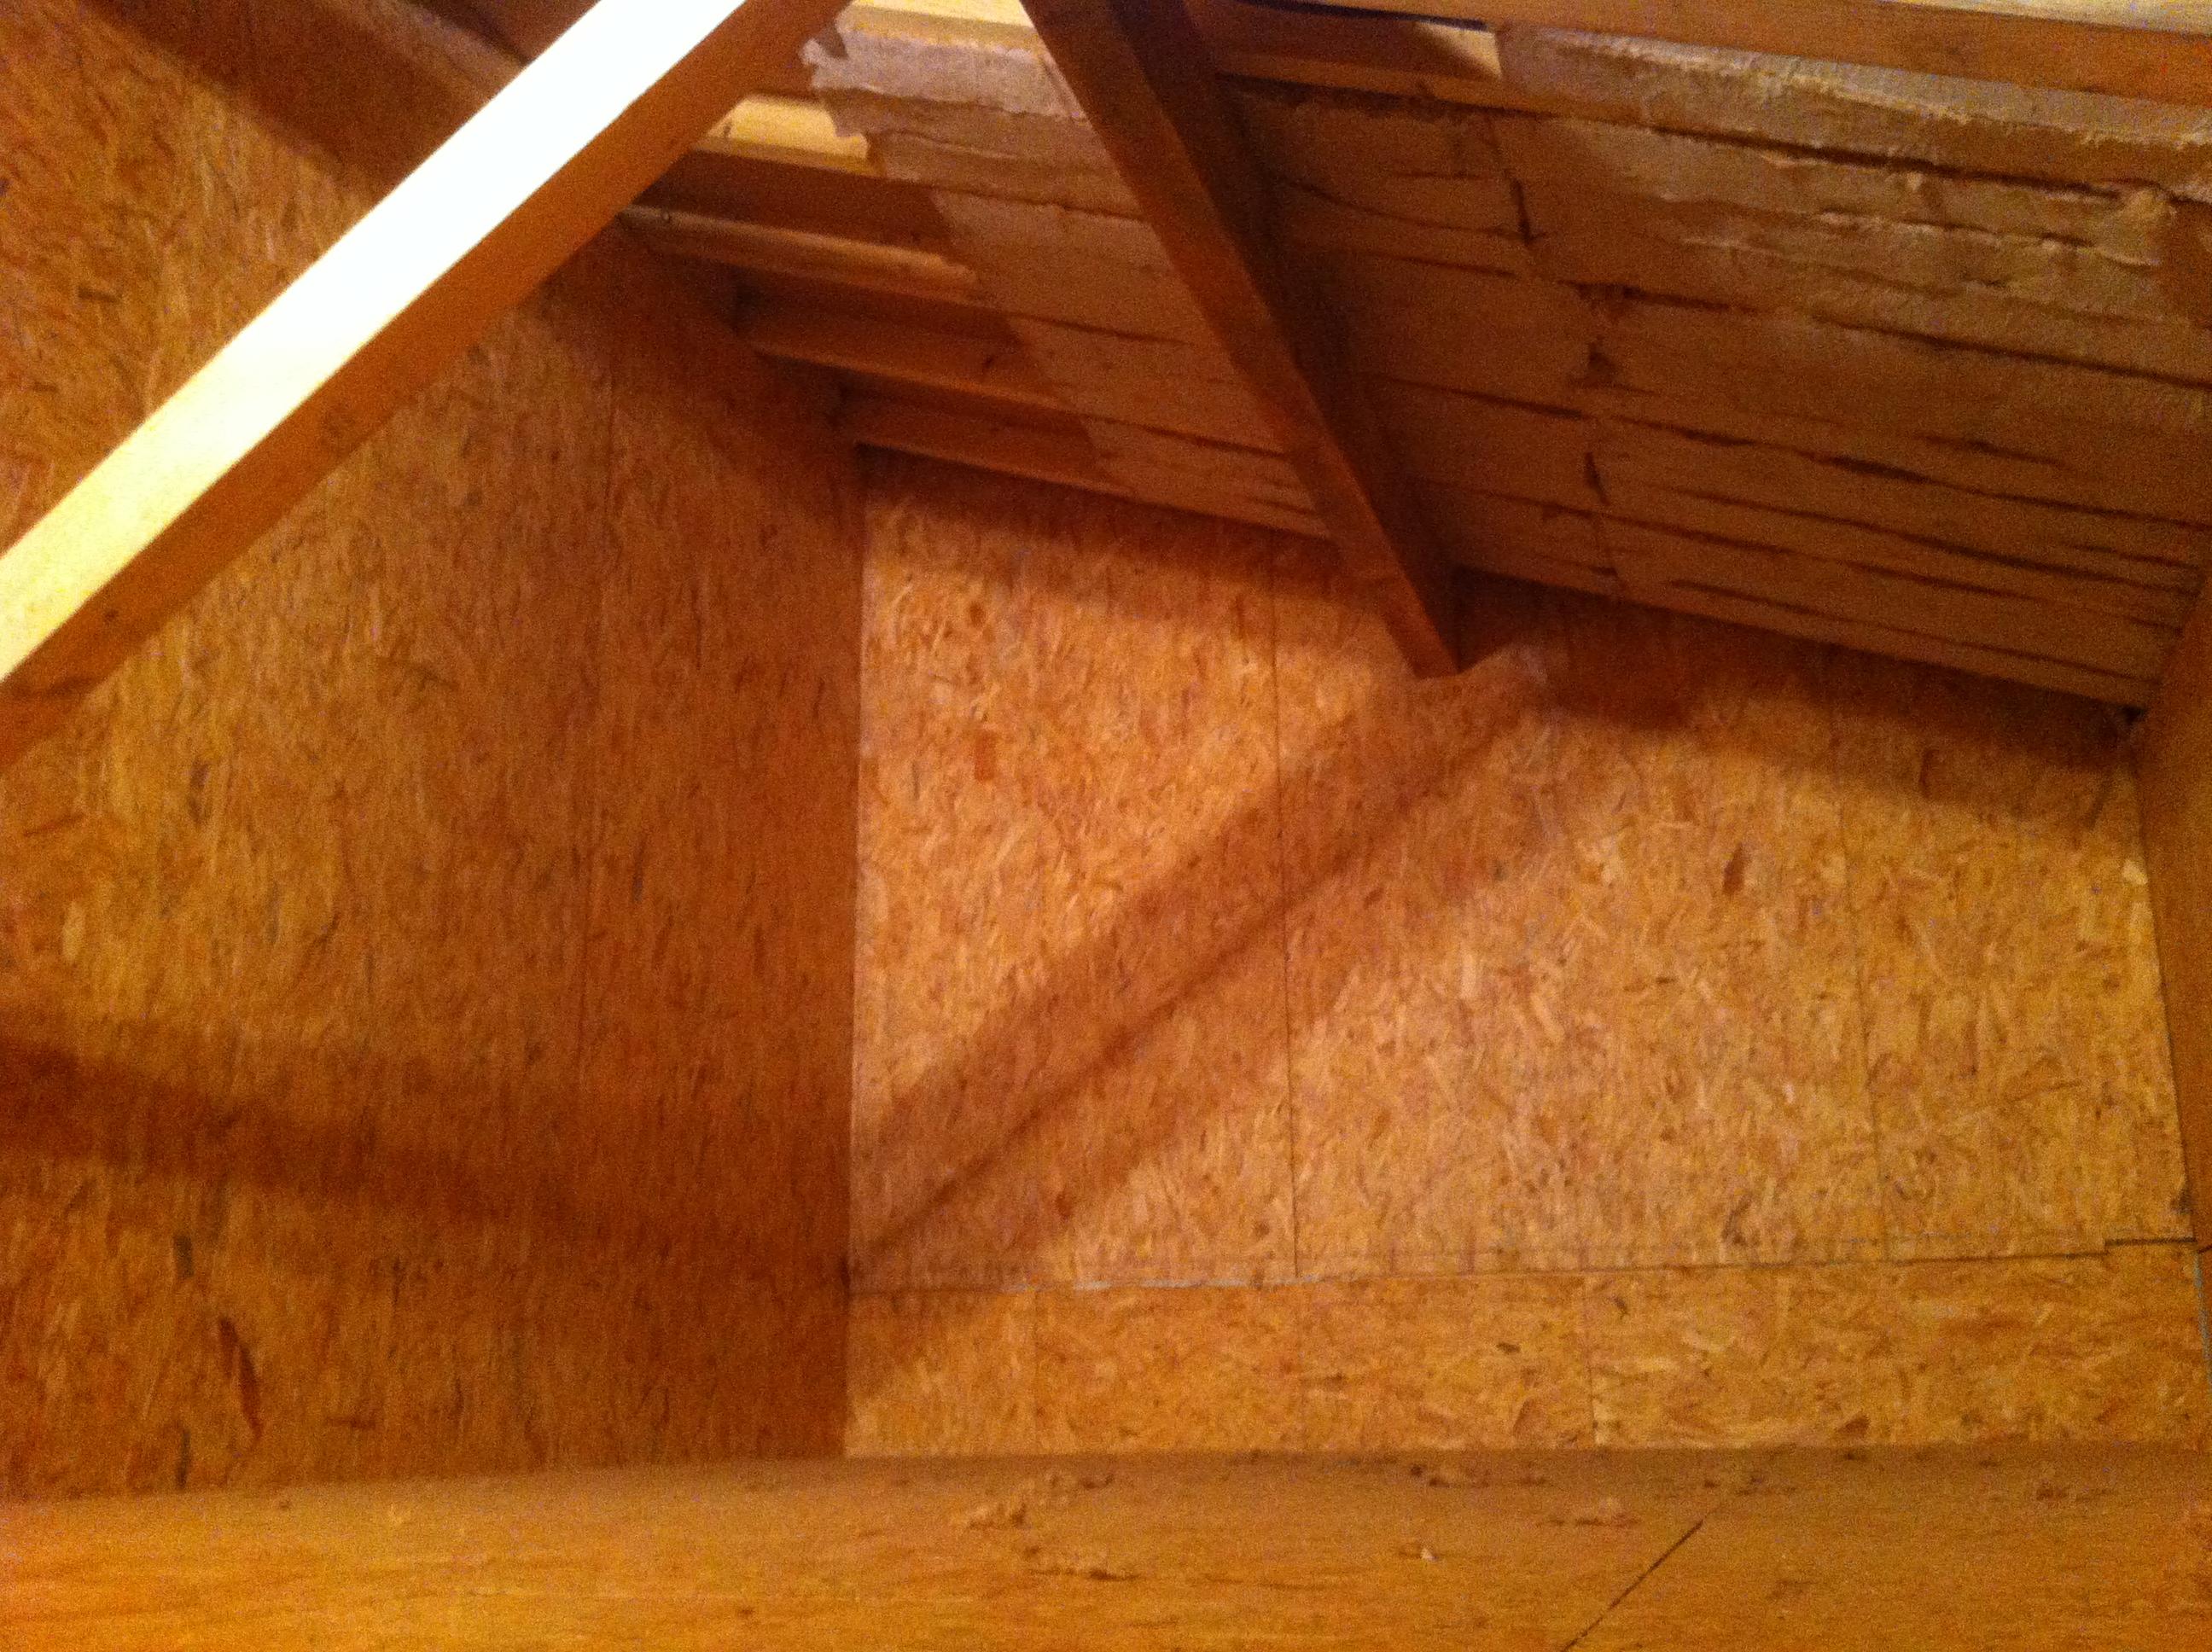 Plancher du garage isolation de la partie toiture au dessus blog maison - Isolation plancher garage ...